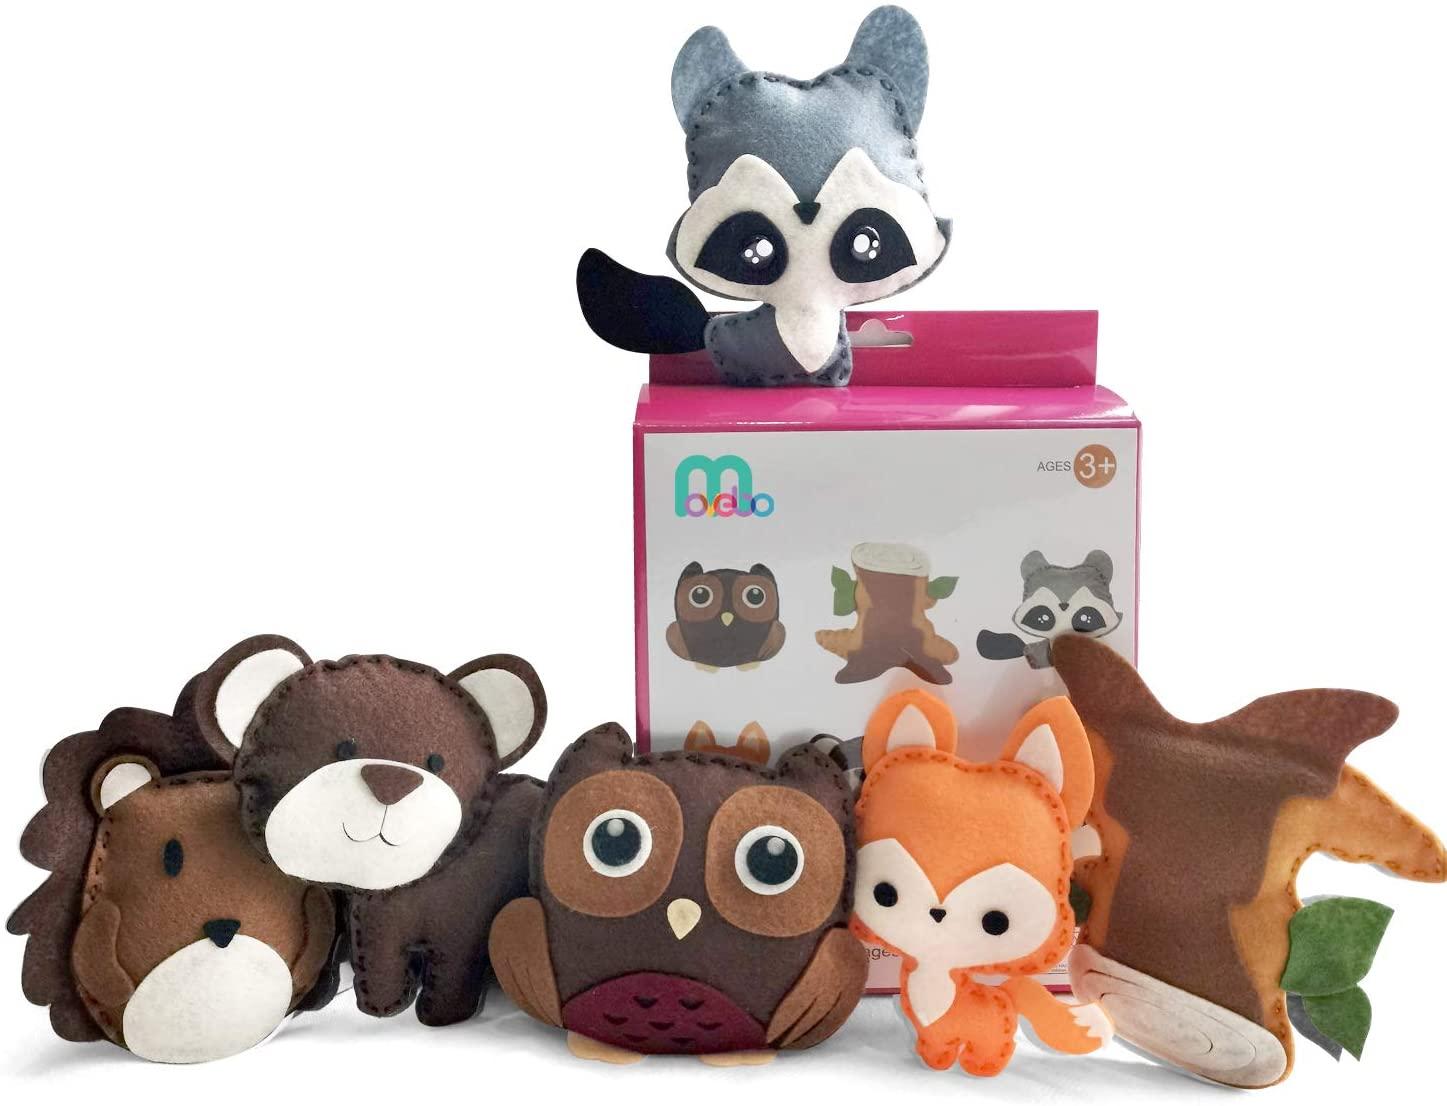 Felt DIY Sewing Crafts (Forest Animal DIY Set),Stitch & Sew Your Dinosaur Stuffed - DIY Crafts Set for Kids